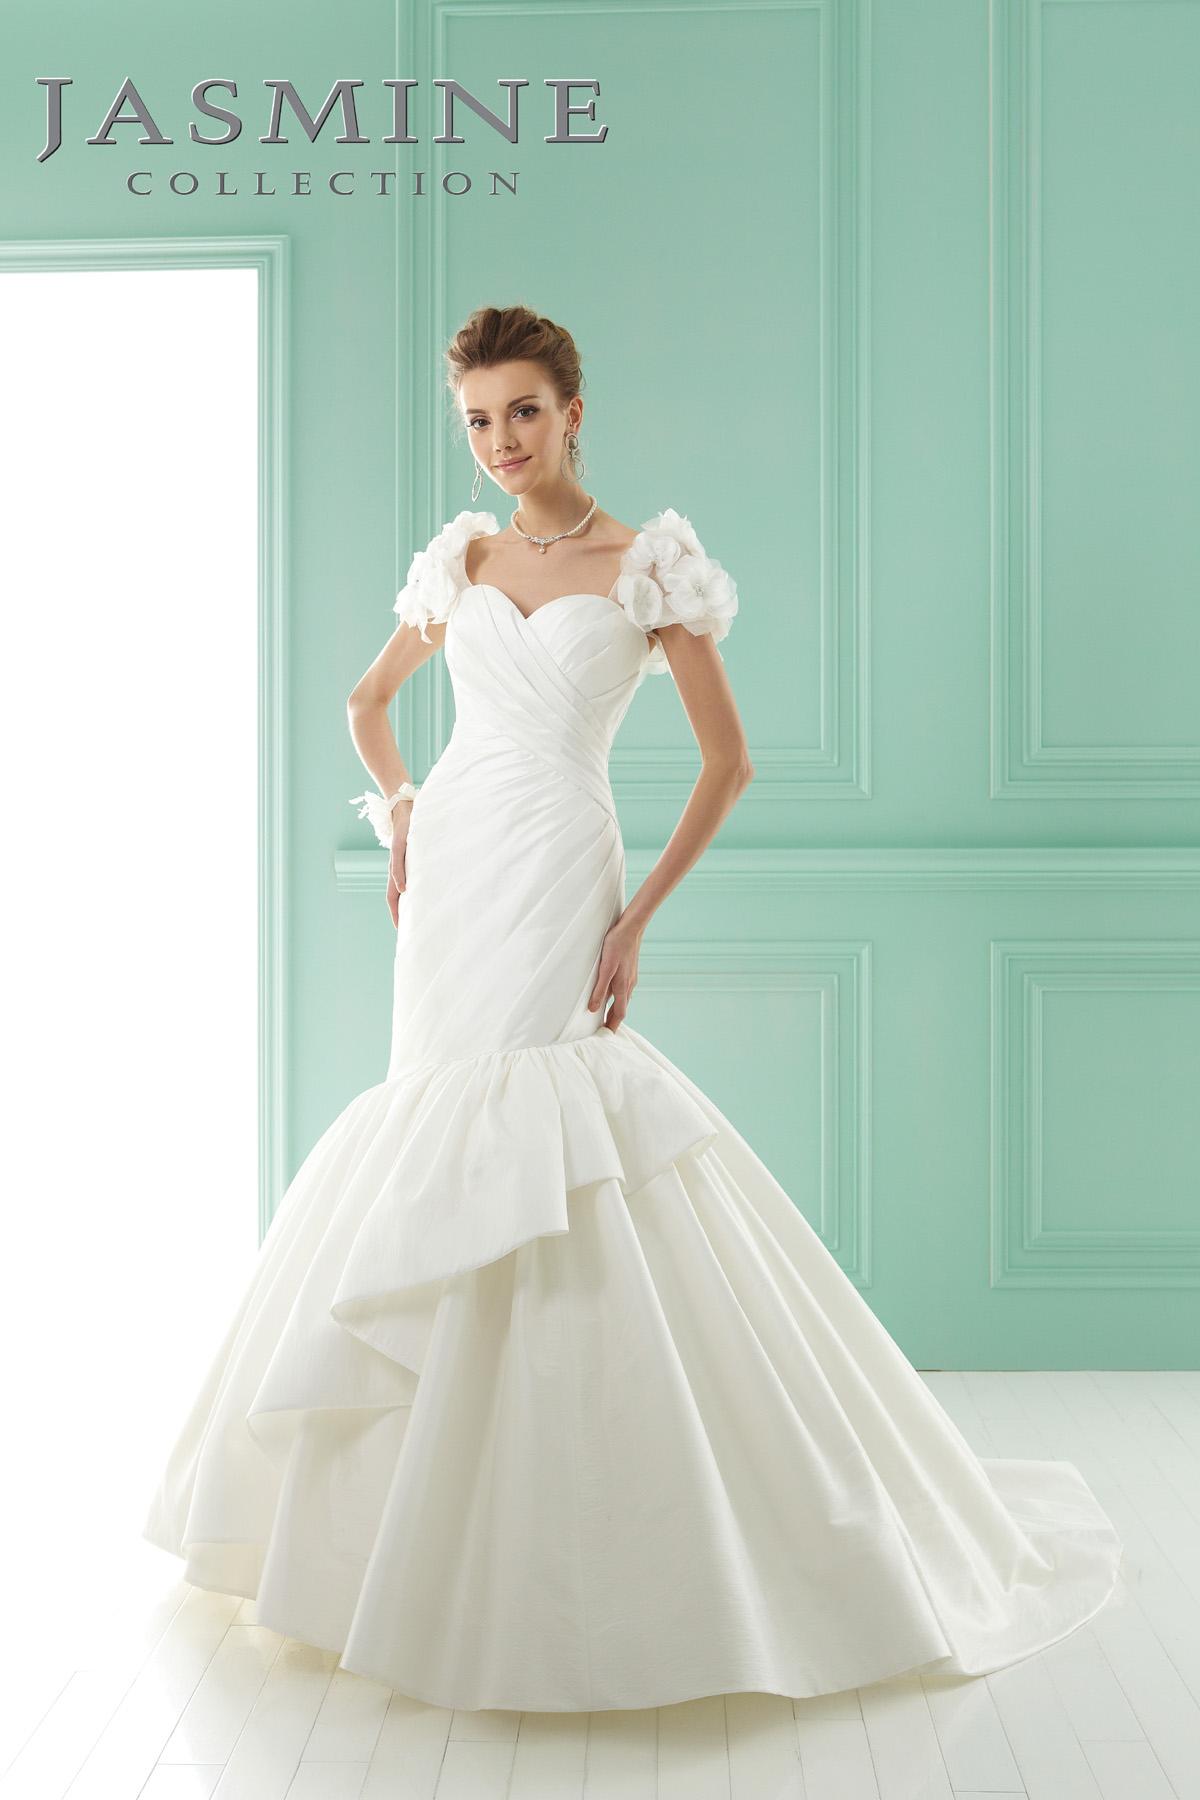 Jasmine Bridal Wedding Gowns